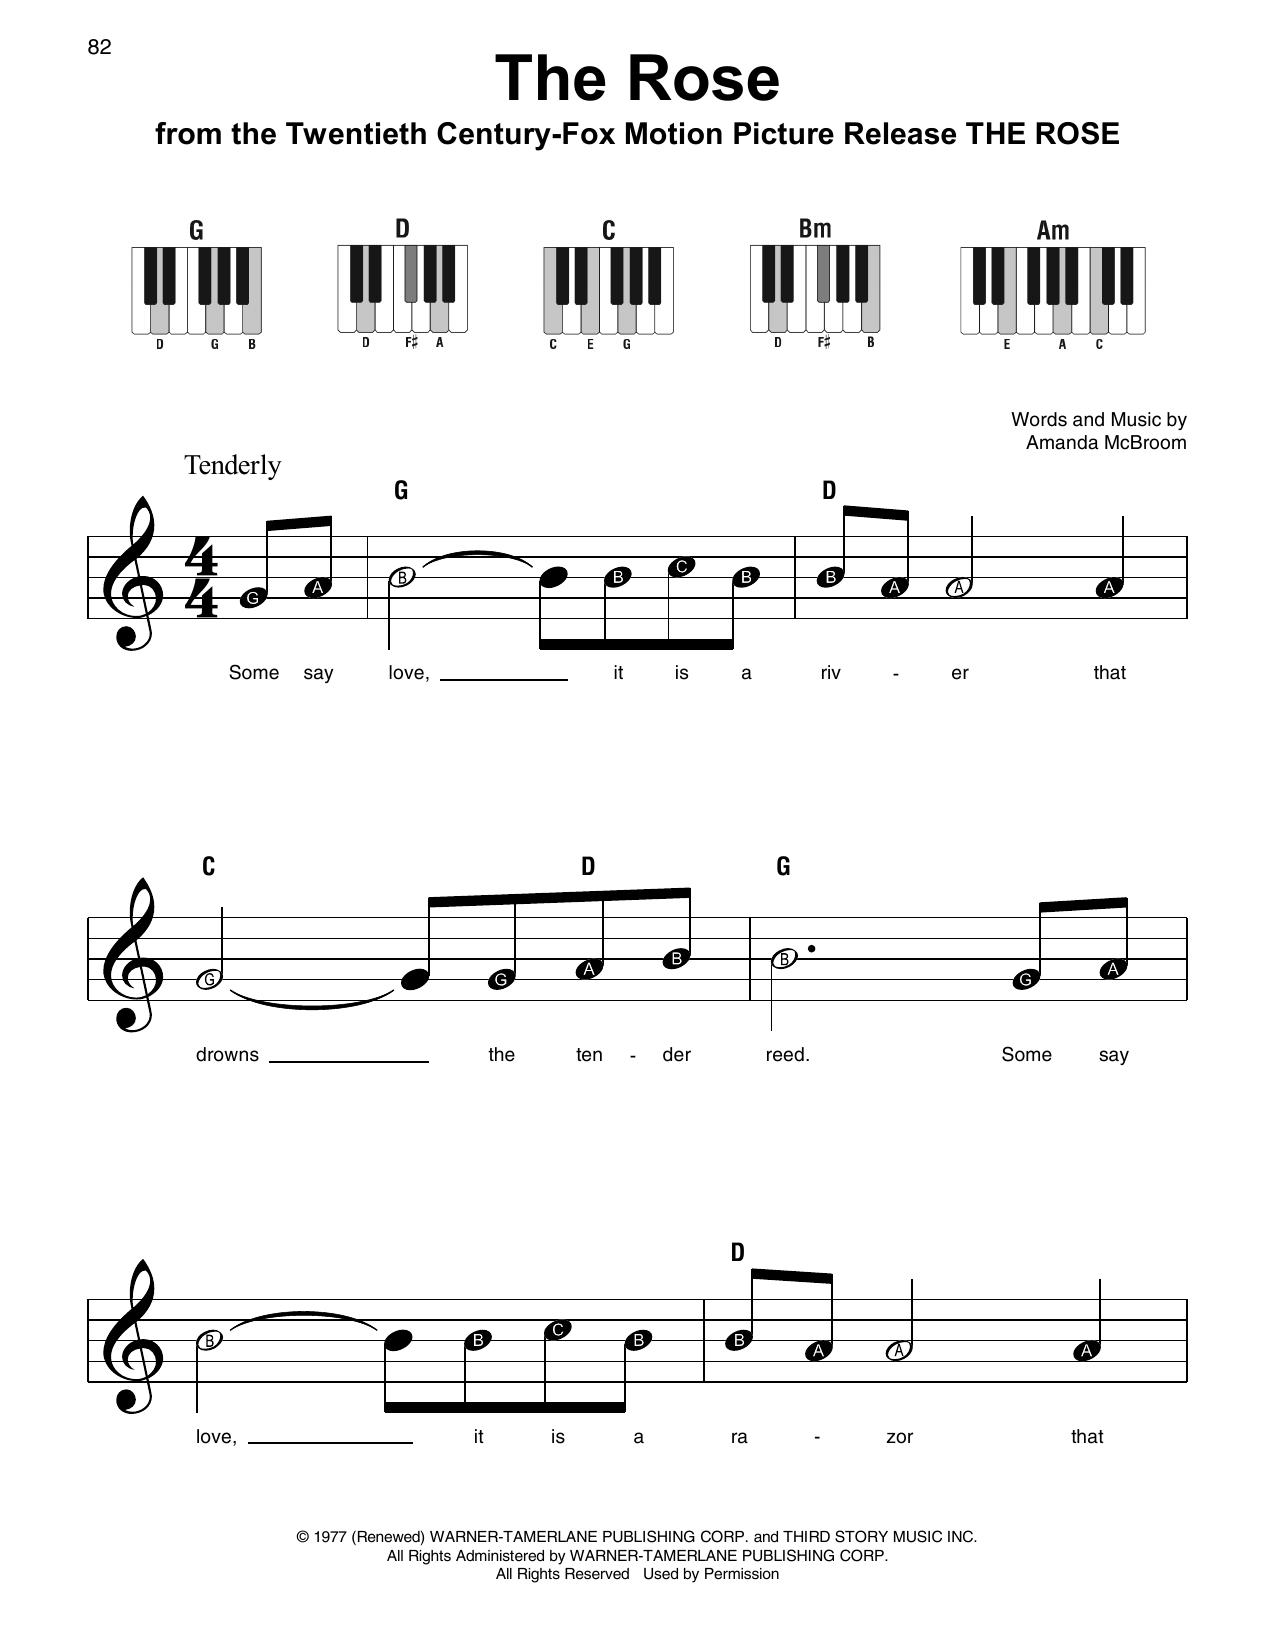 Bette Midler The Rose Sheet Music Notes Chords Printable Film